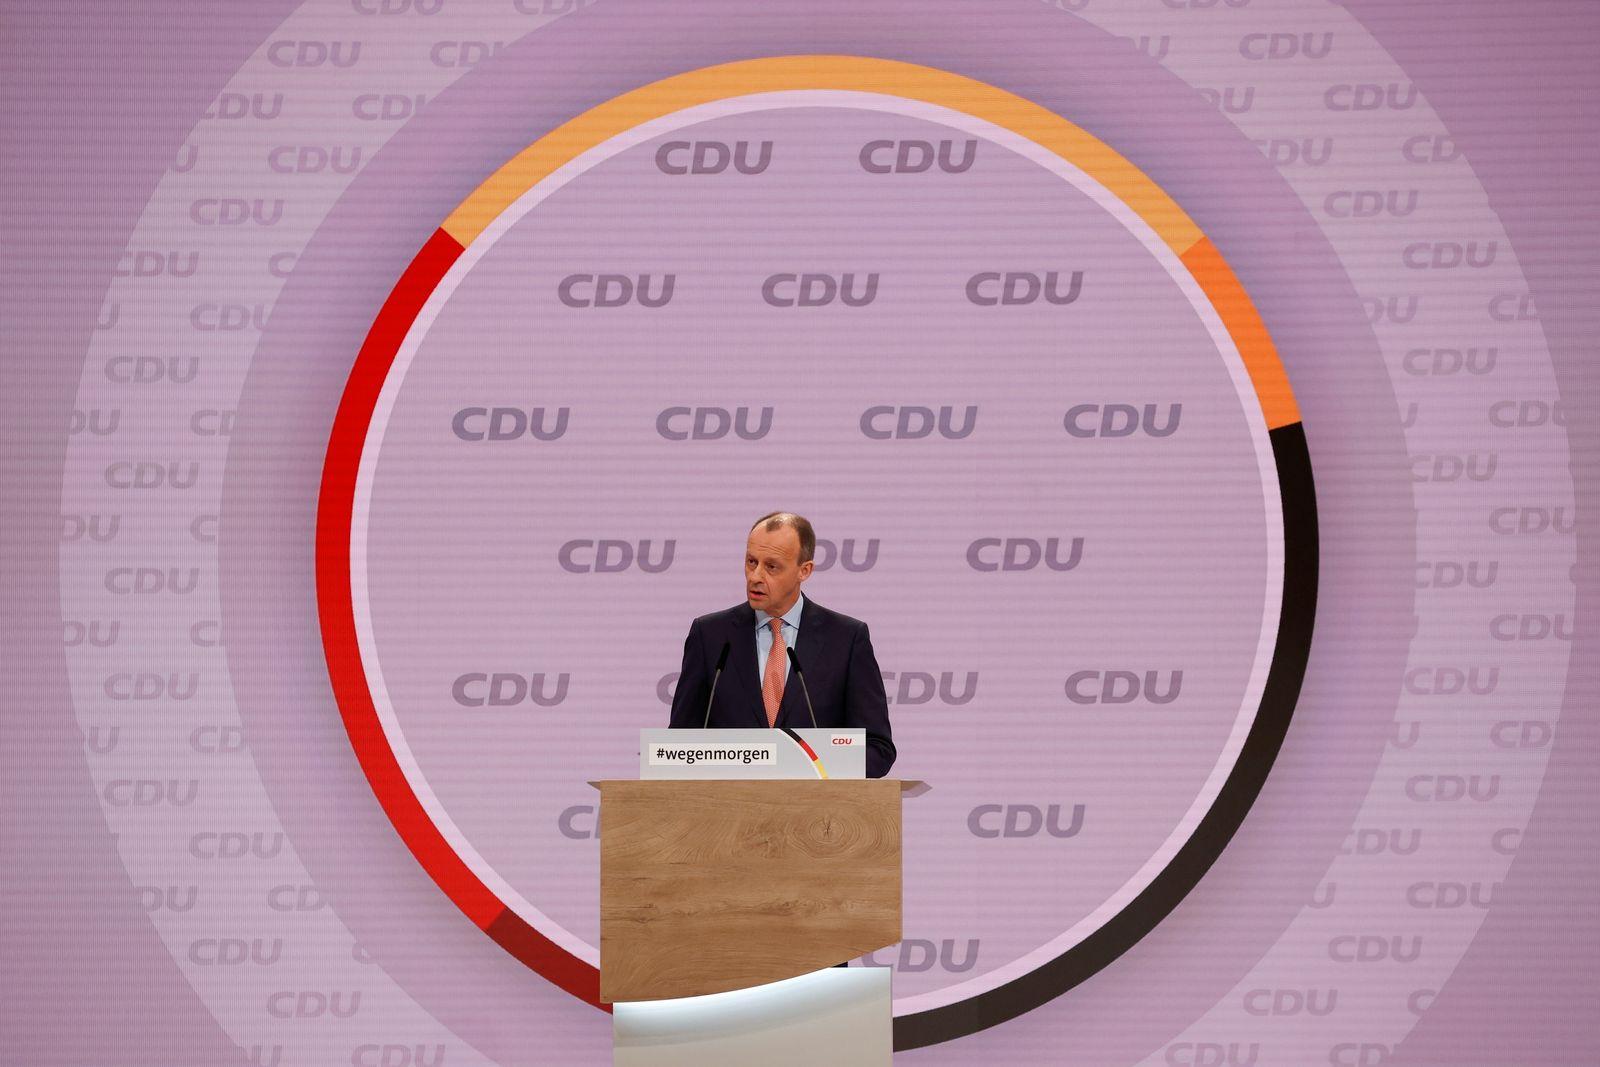 Christian Democratic Union (CDU) party's 33rd congress in Berlin